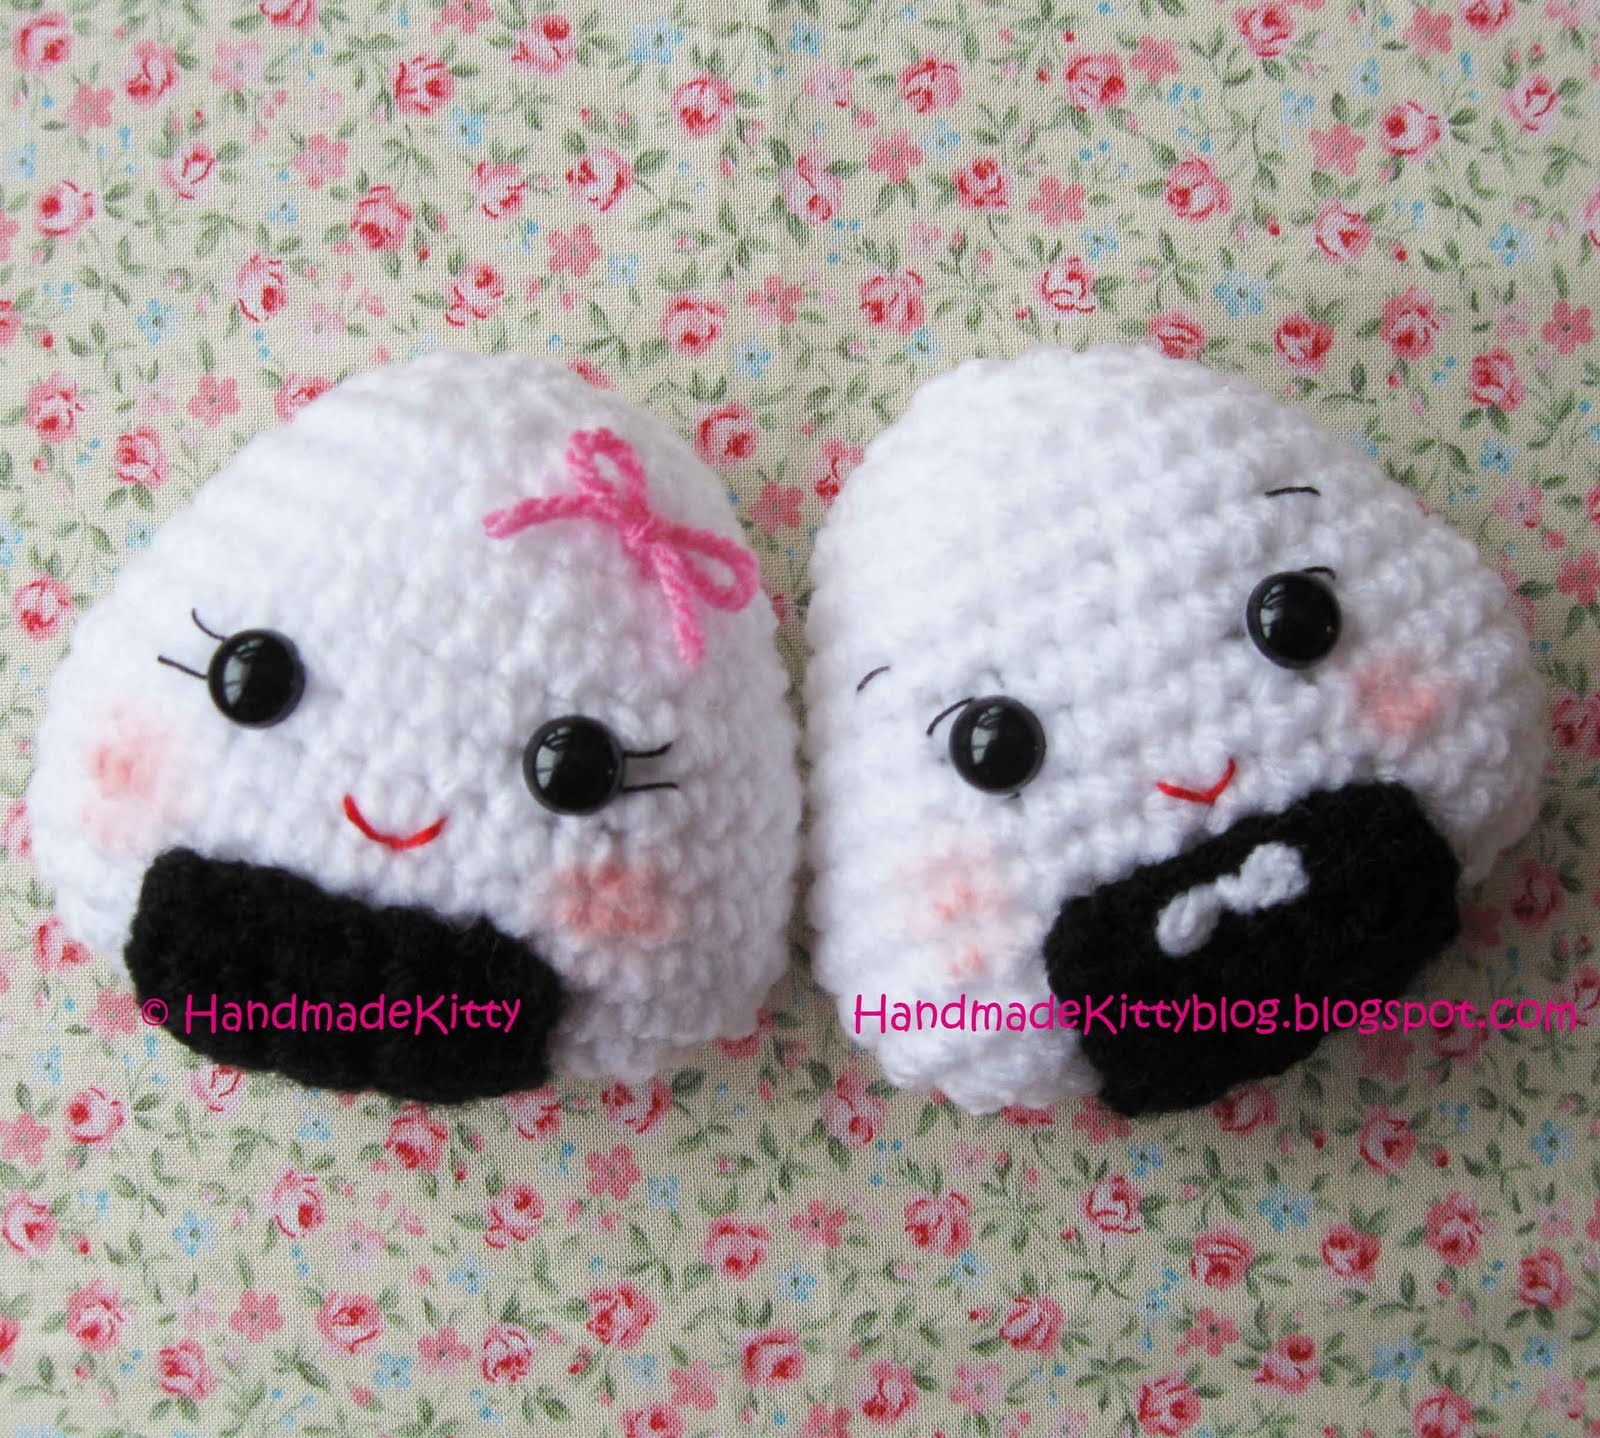 Amigurumi Kawaii Free Patterns : HandmadeKitty: FREE Onigiri Couple Amigurumi Crochet ...